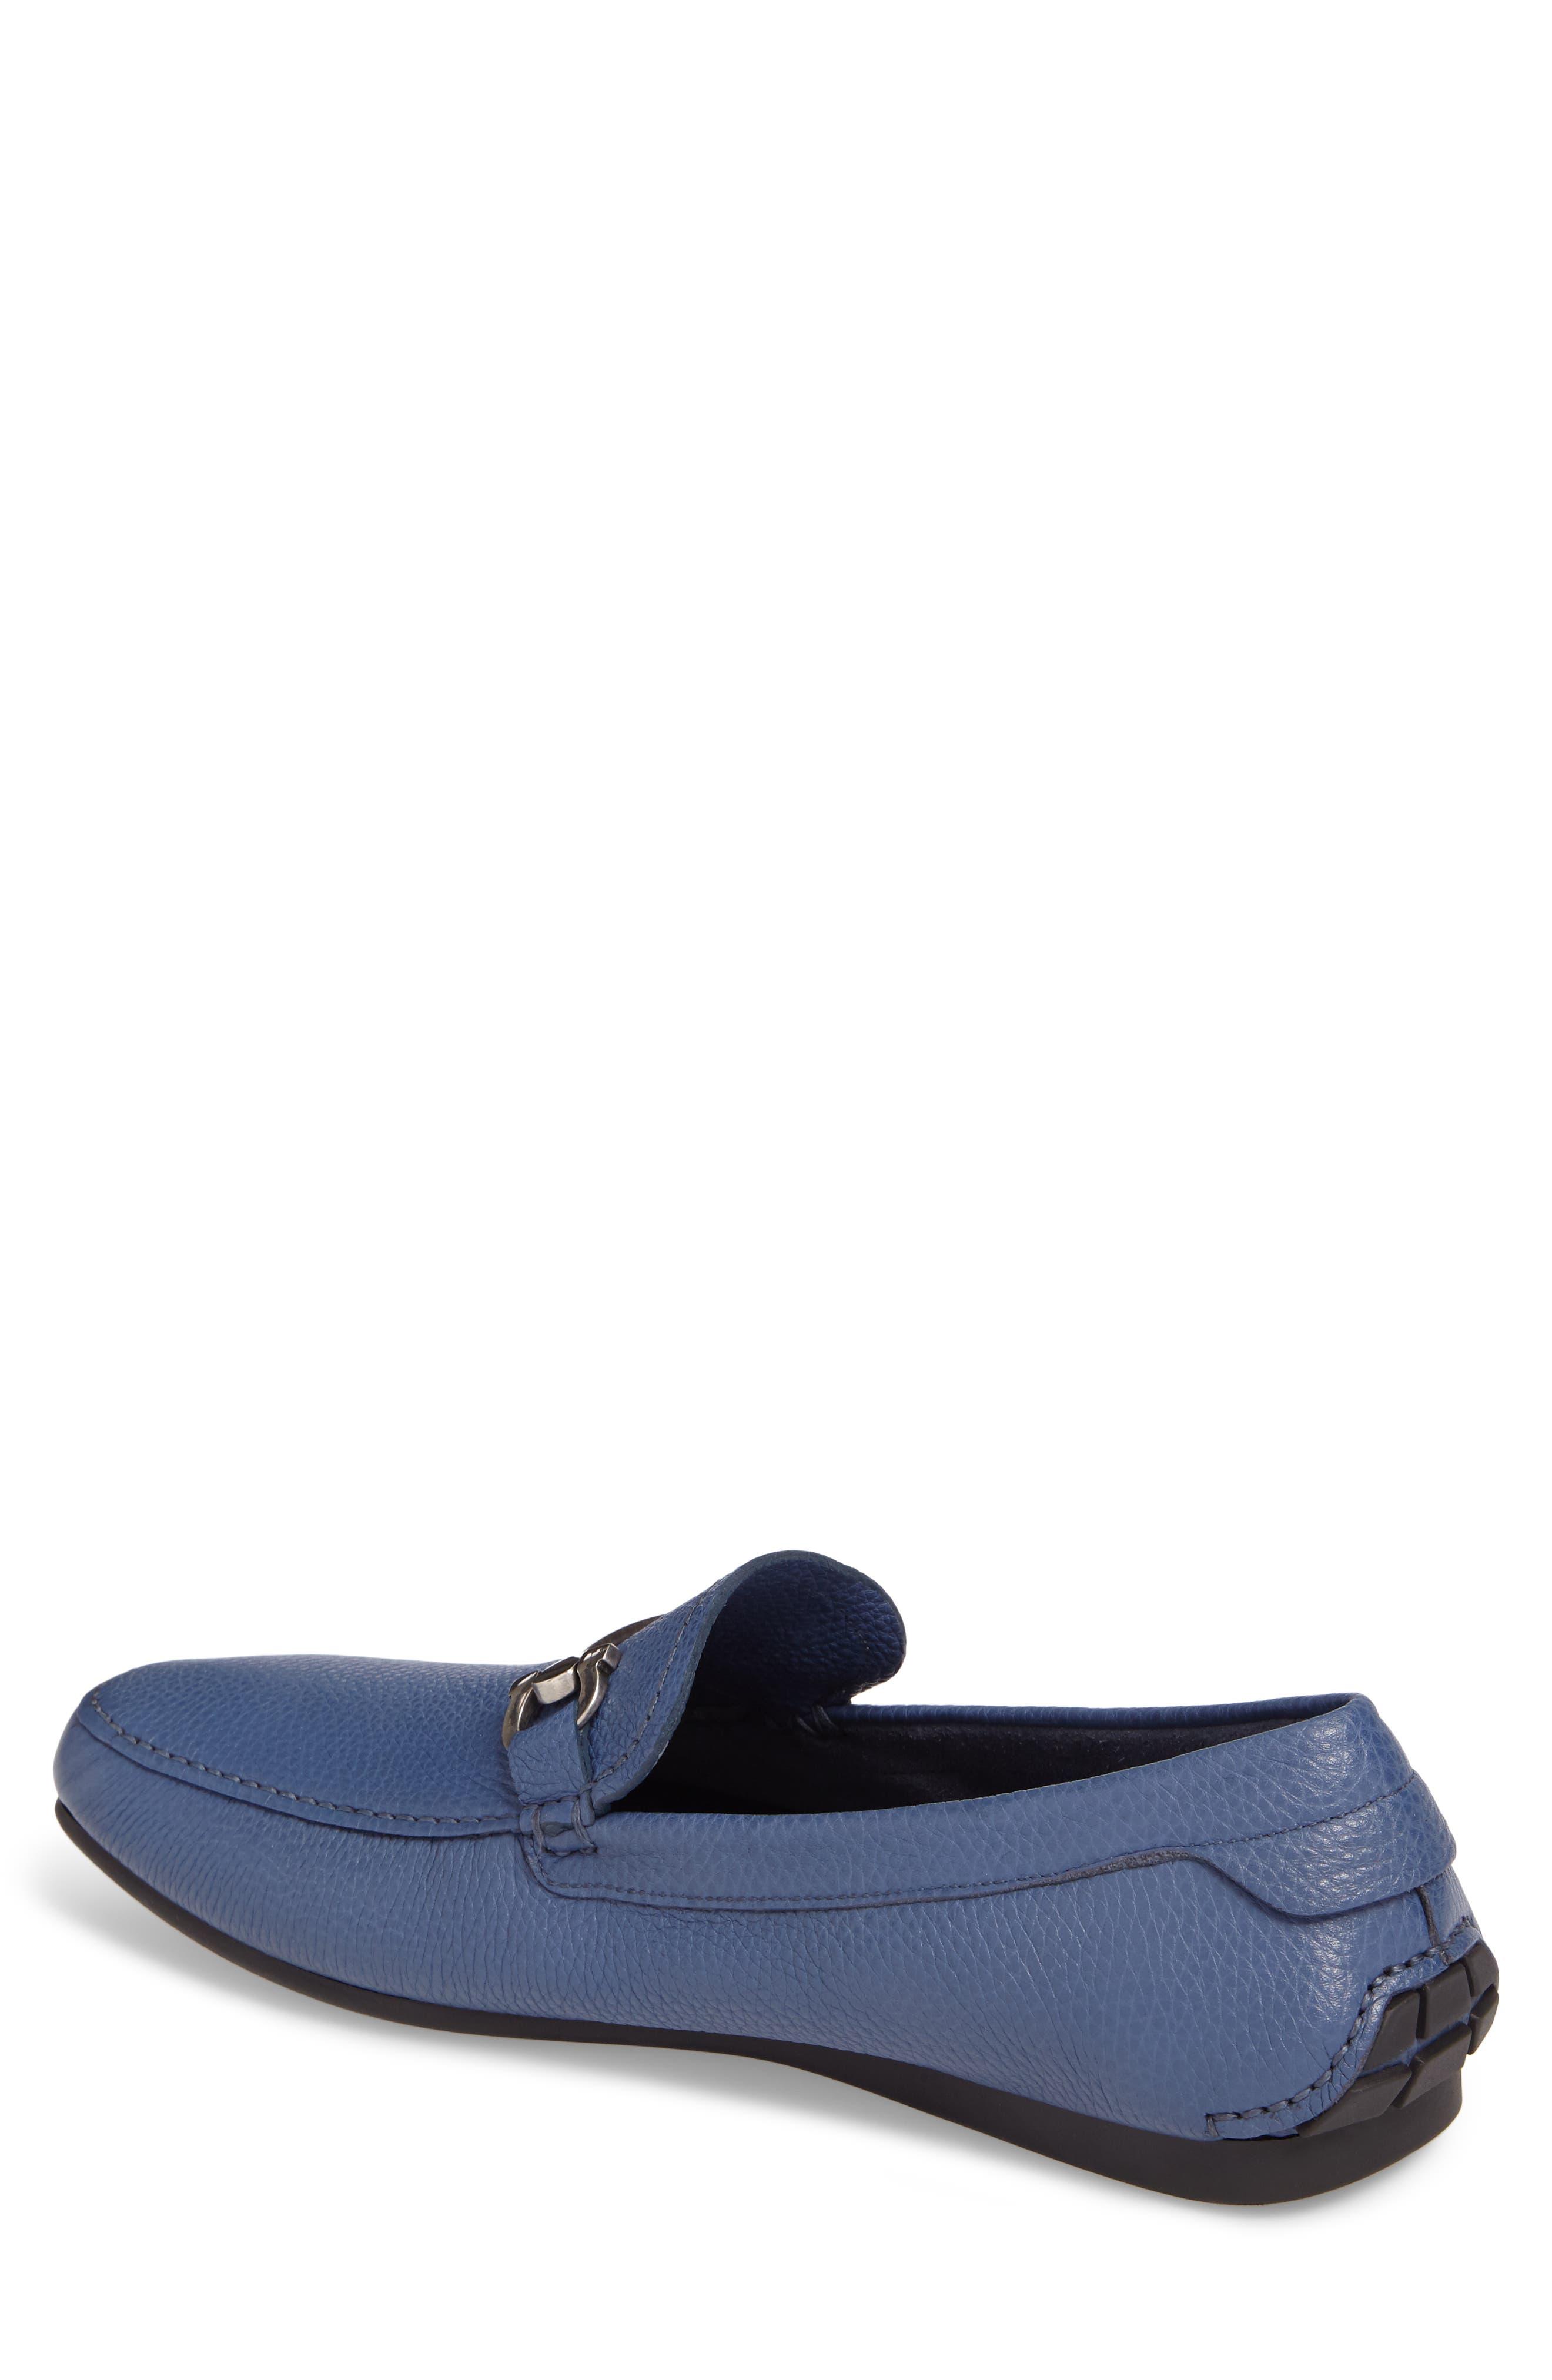 Cancun 2 Driving Shoe,                             Alternate thumbnail 2, color,                             Fjord Blue